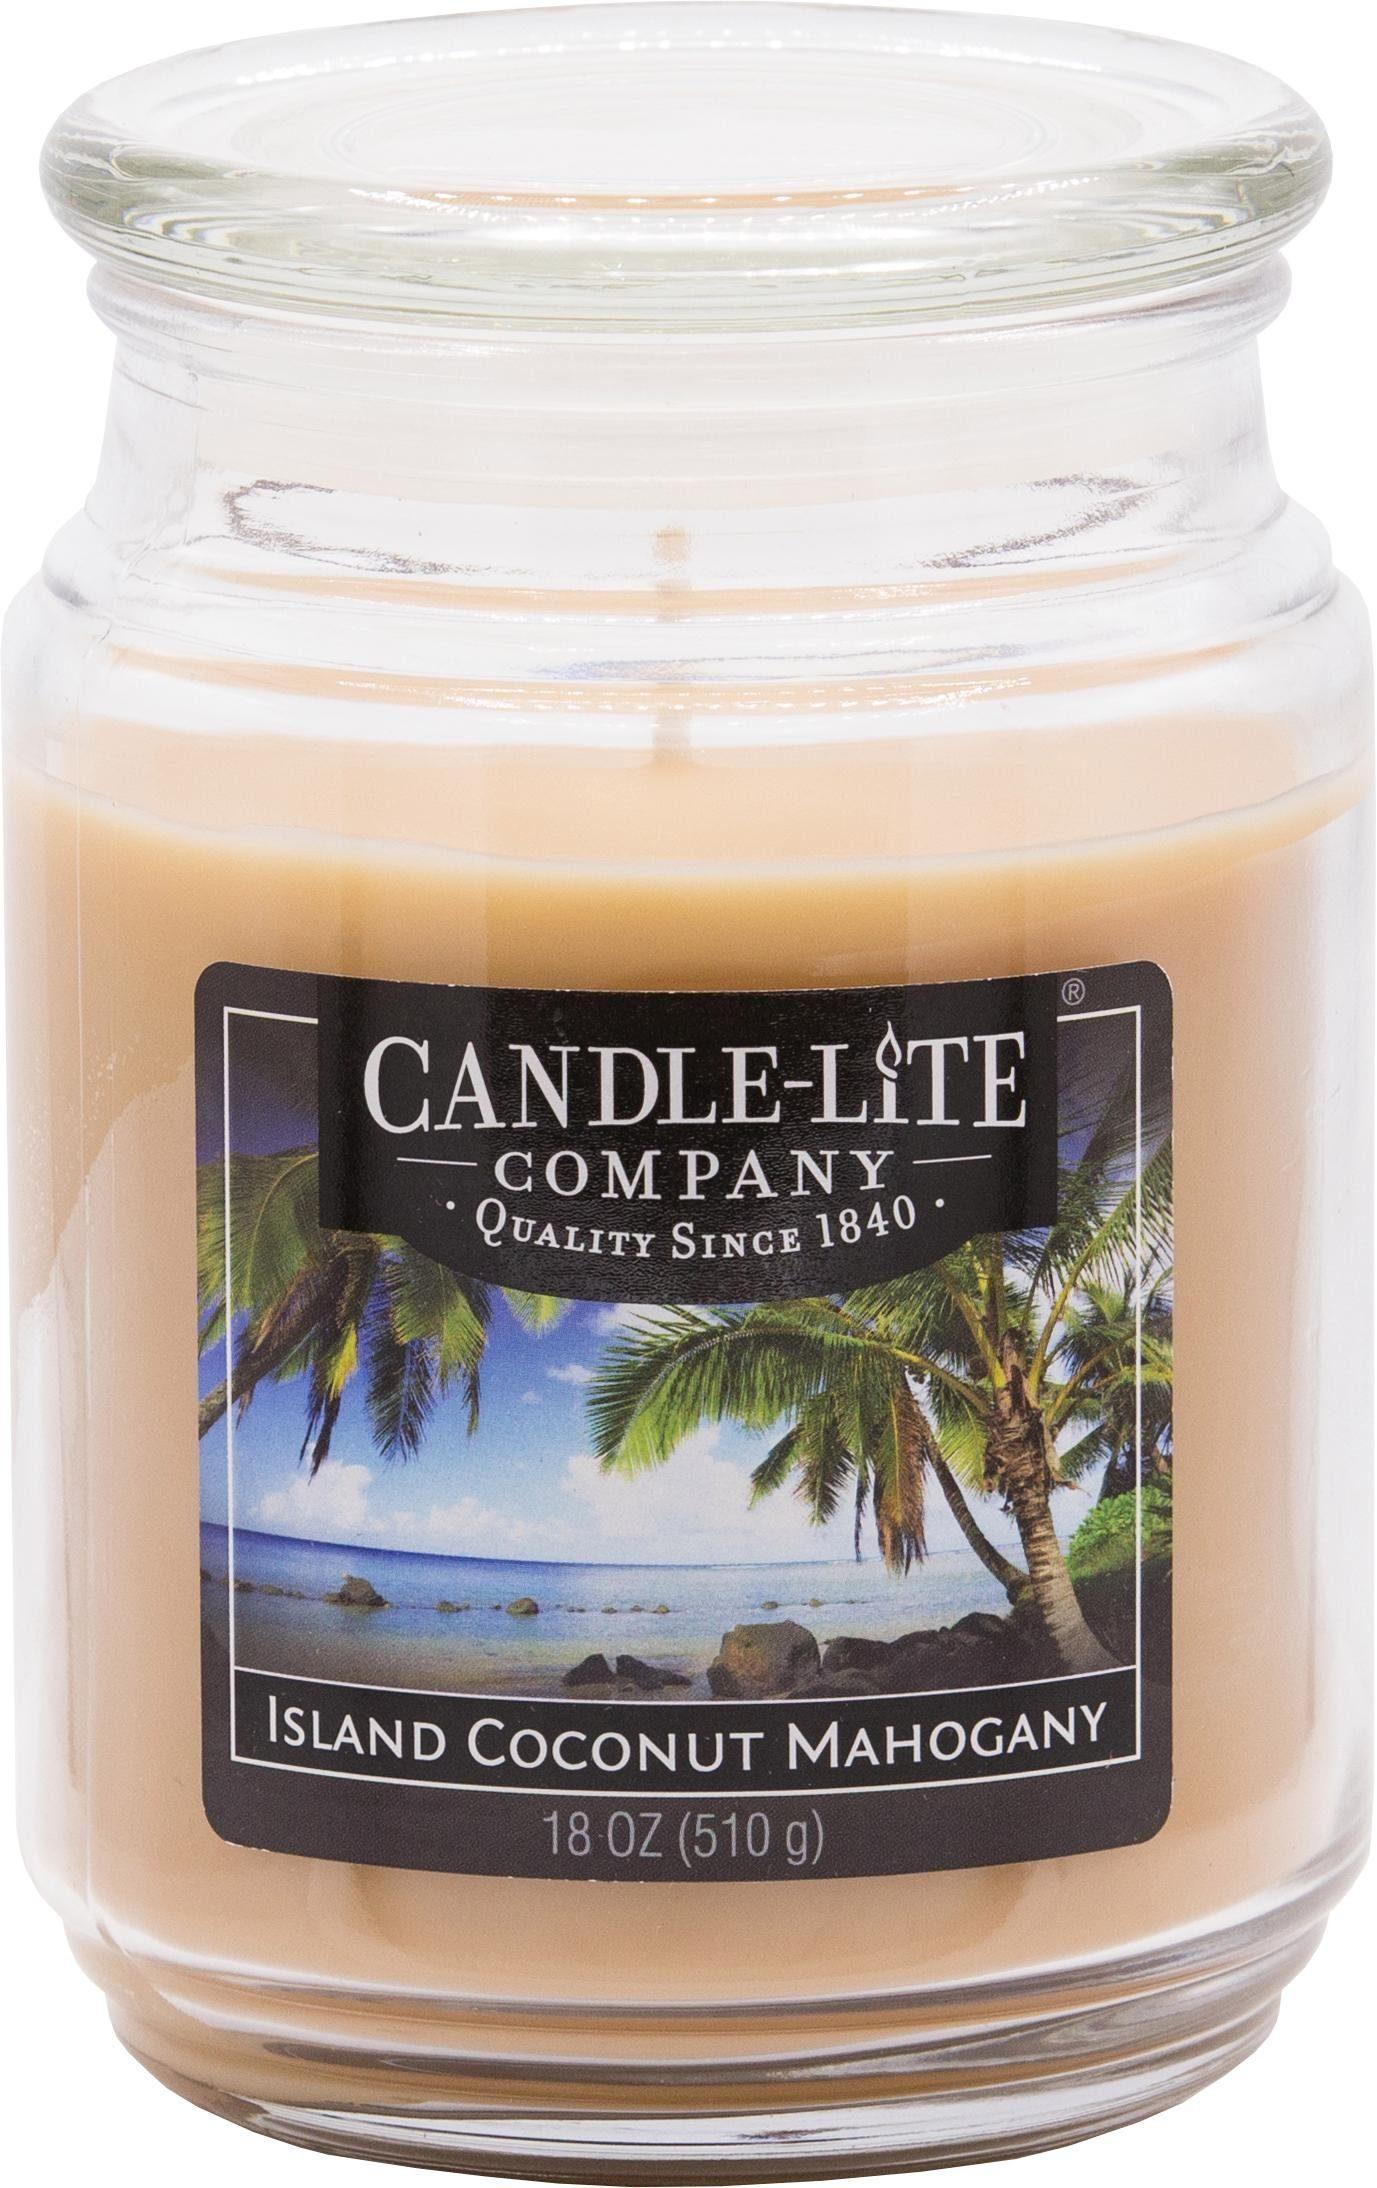 Candle-lite Duftkerze, 510g, »Everyday - Island Coconut Mahogany«